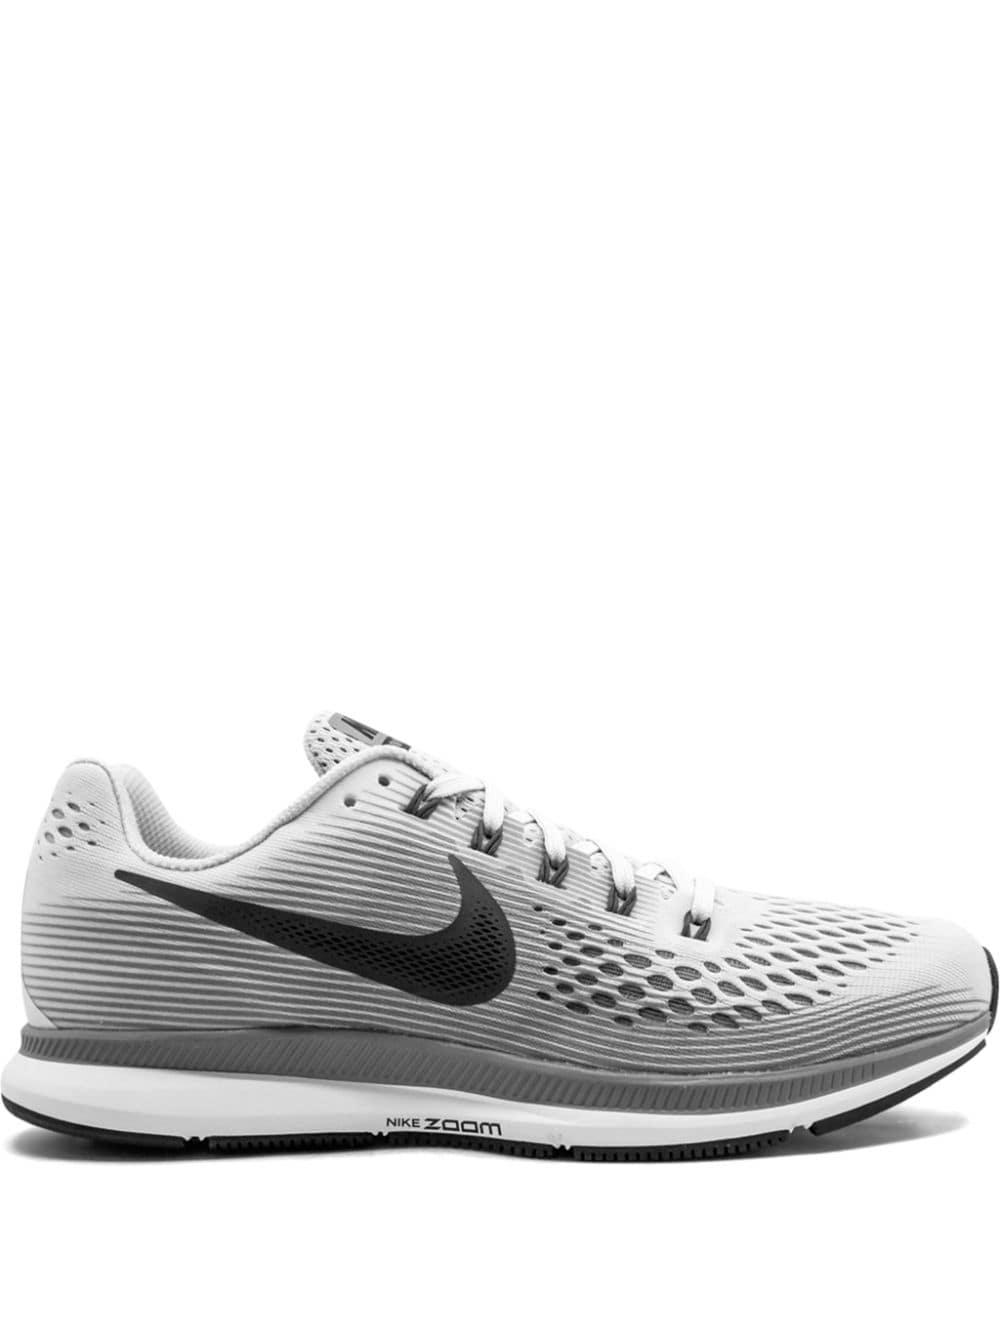 Nike Nike Air Zoom Pegasus 34 Sneakers Grey Nike Shoes Nike Air Zoom Pegasus Nike Air Zoom Sneakers Grey